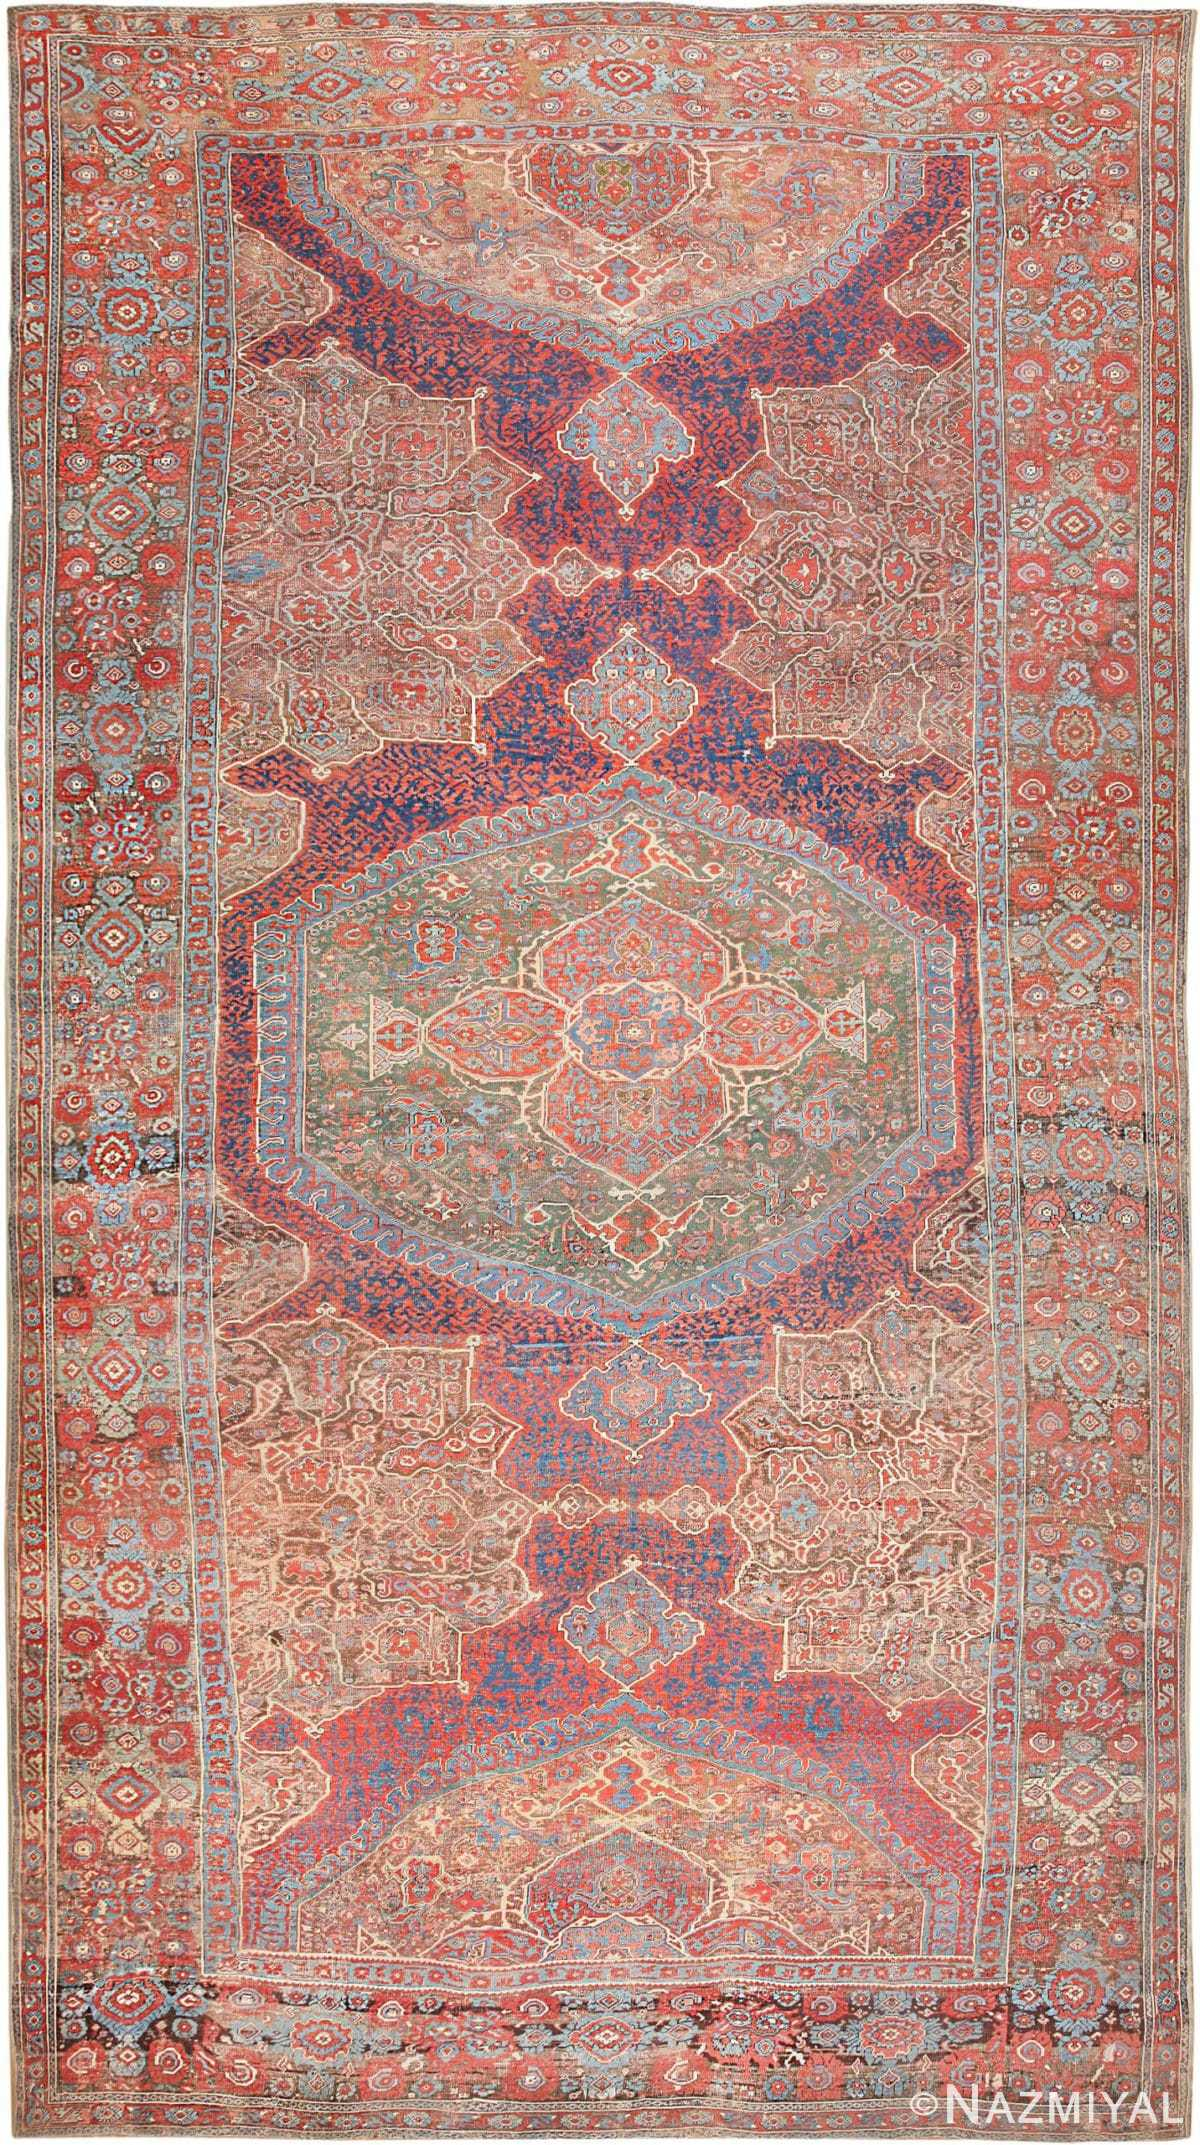 Antique Smyrna Oushak Carpet 47072 Nazmiyal